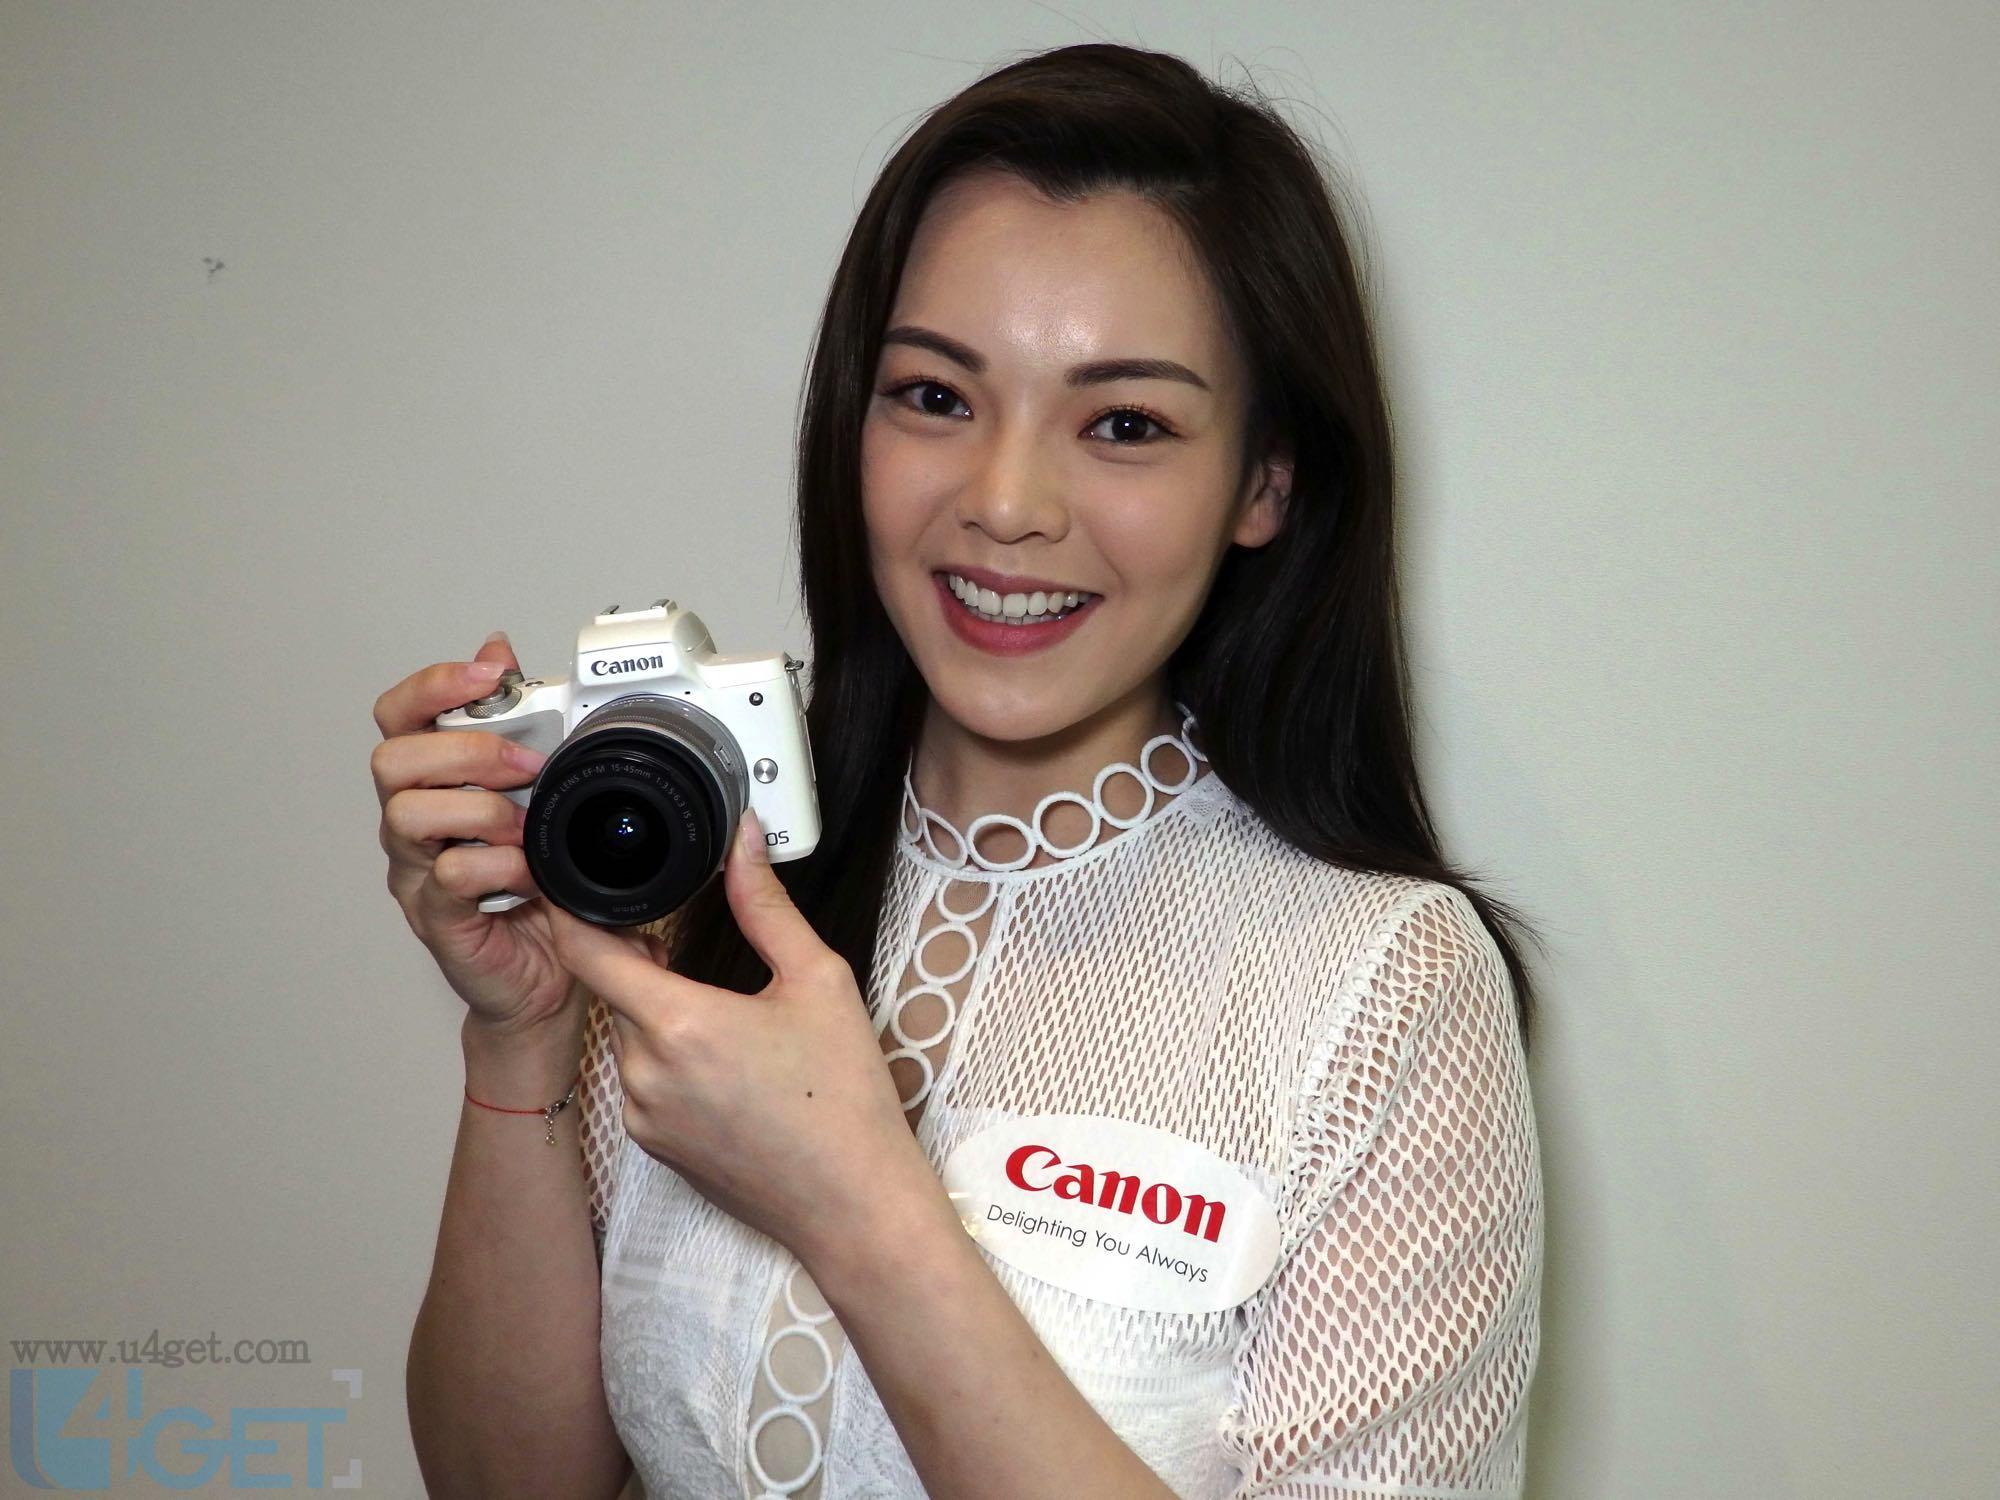 專為 VLOG / YouTuber 而設  Canon EOS M50 眼睛追蹤影人更靚